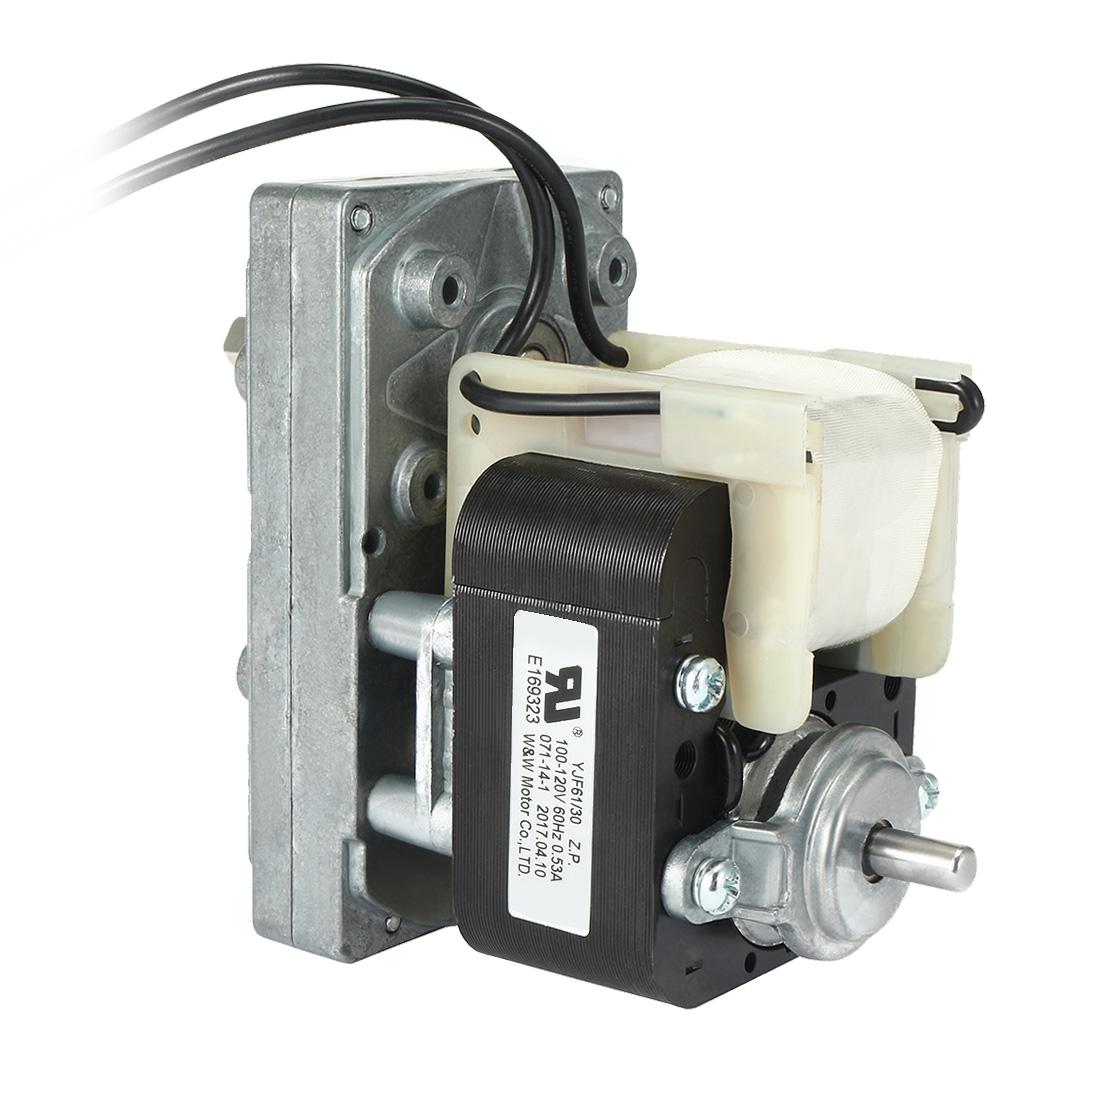 FC-YJ61 AC100V-120V 60Hz 25RPM CW Shaded Pole Motor Universal Geared Motor